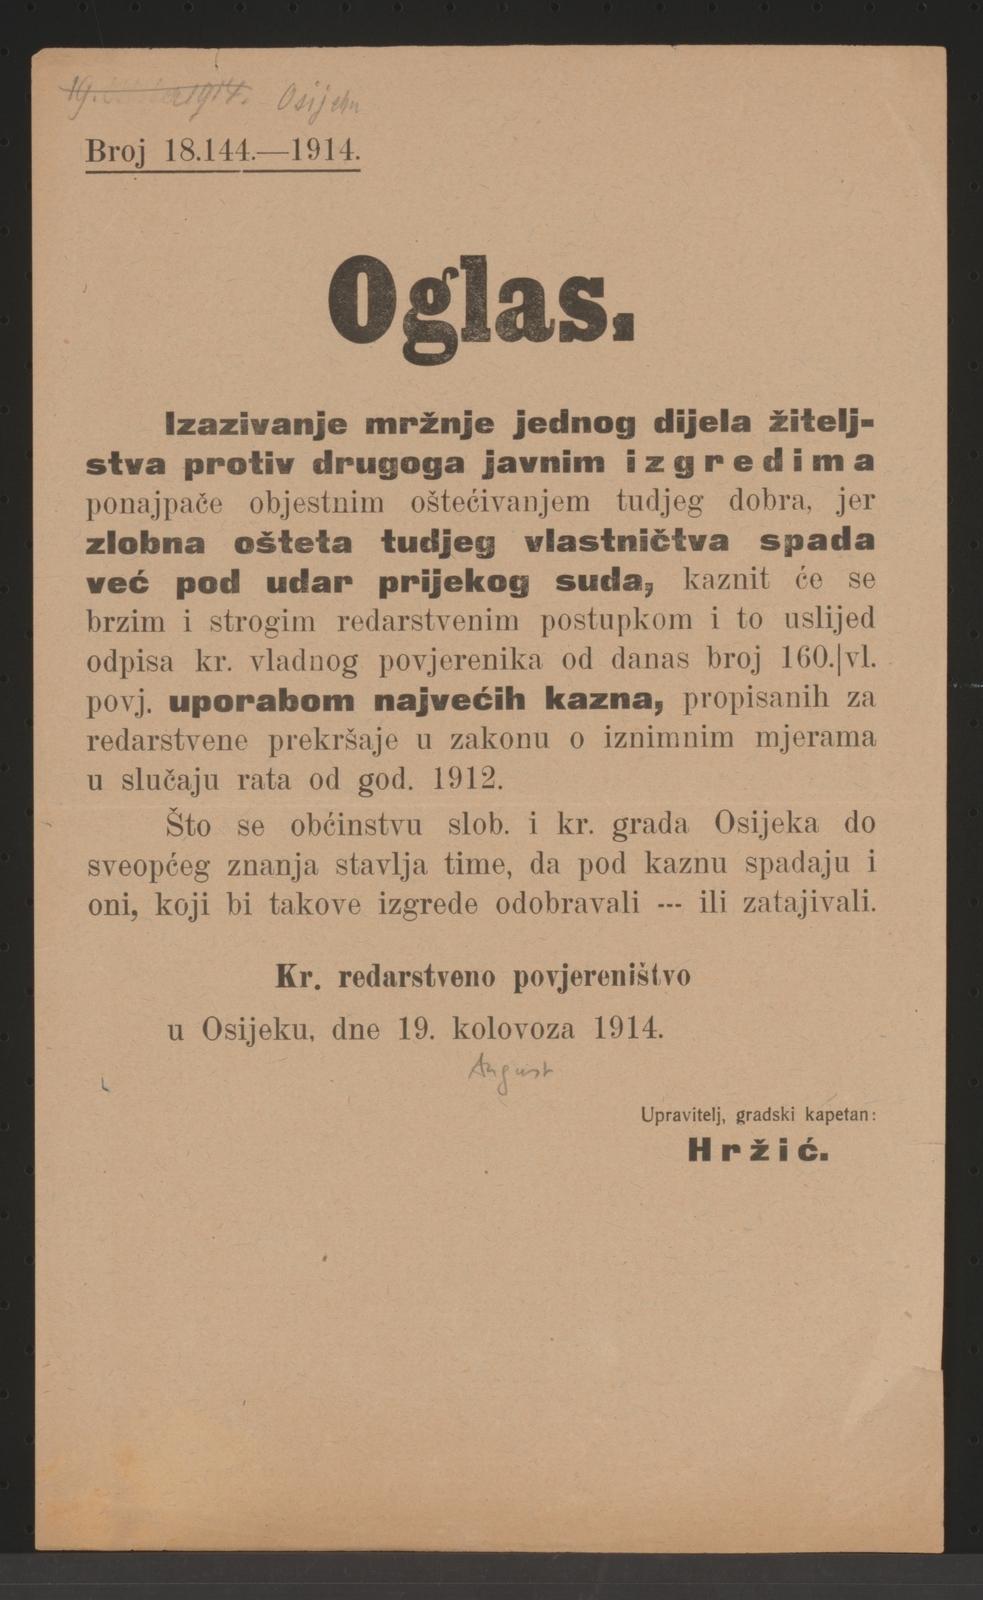 Verbrechensbekämpfung - Kriegsrecht - Bekanntmachung - Osijek - In kroatischer Sprache